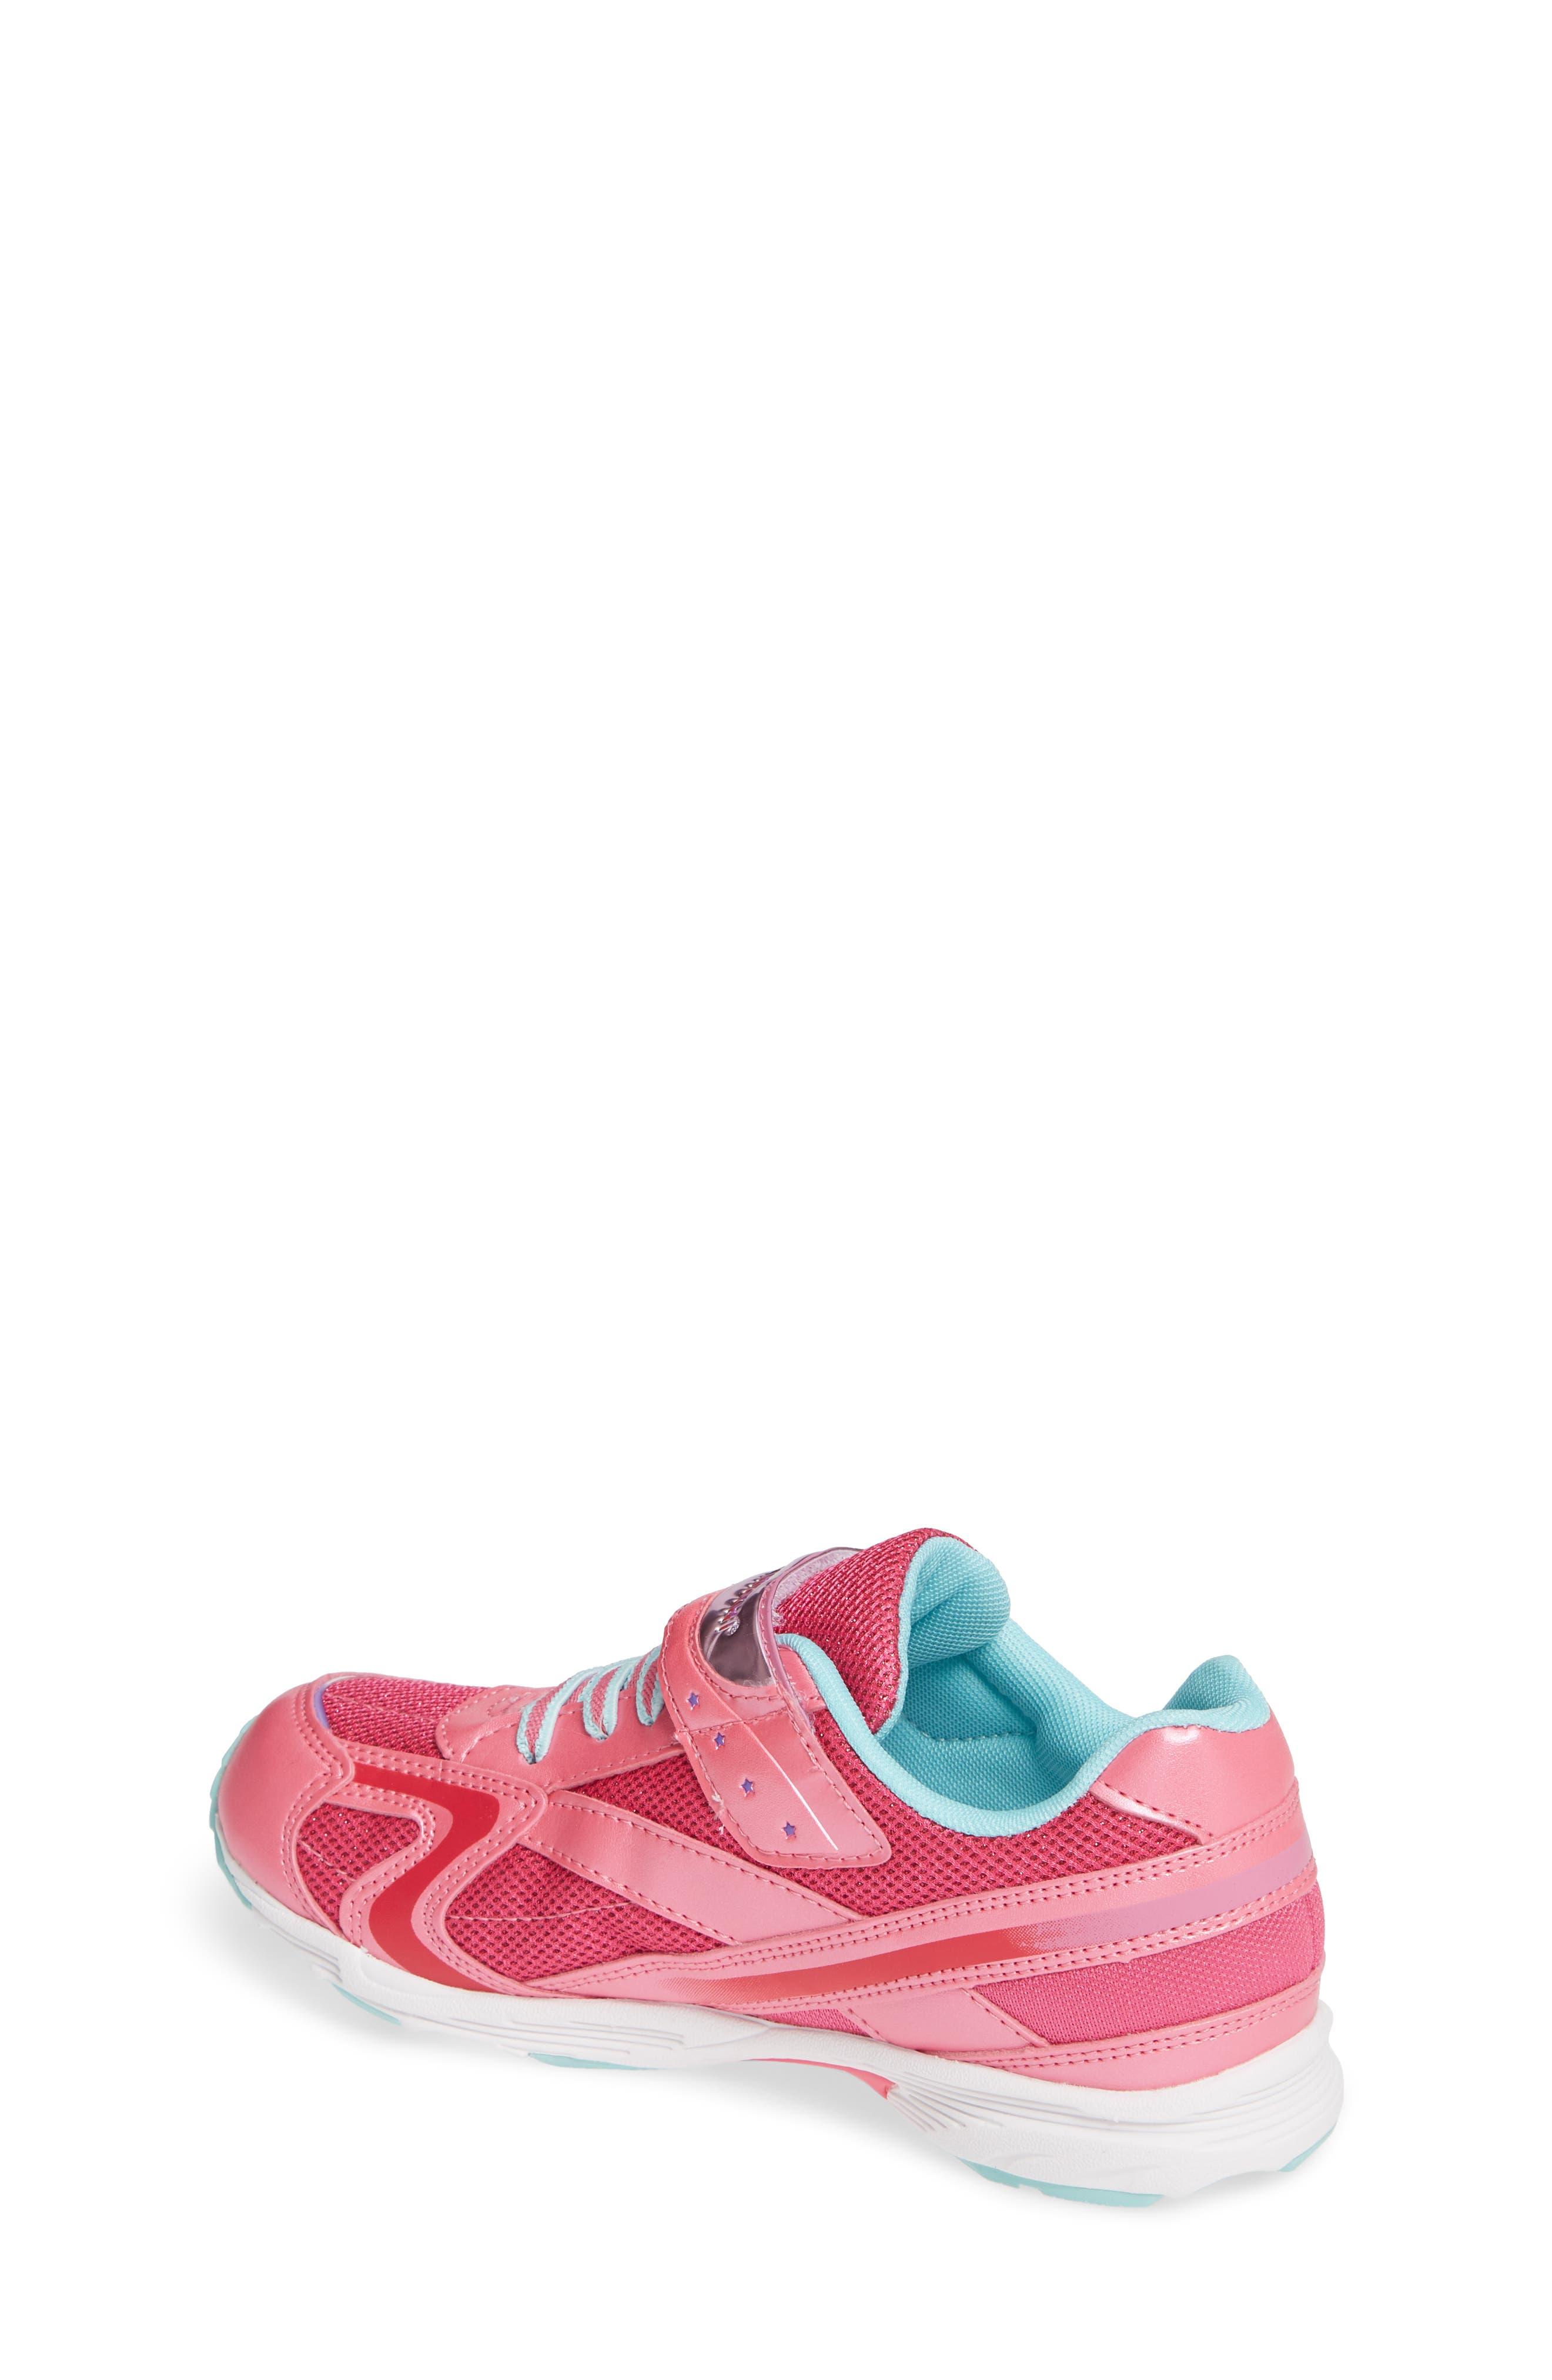 Glitz Washable Sneaker,                             Alternate thumbnail 2, color,                             Hot Pink/ Mint